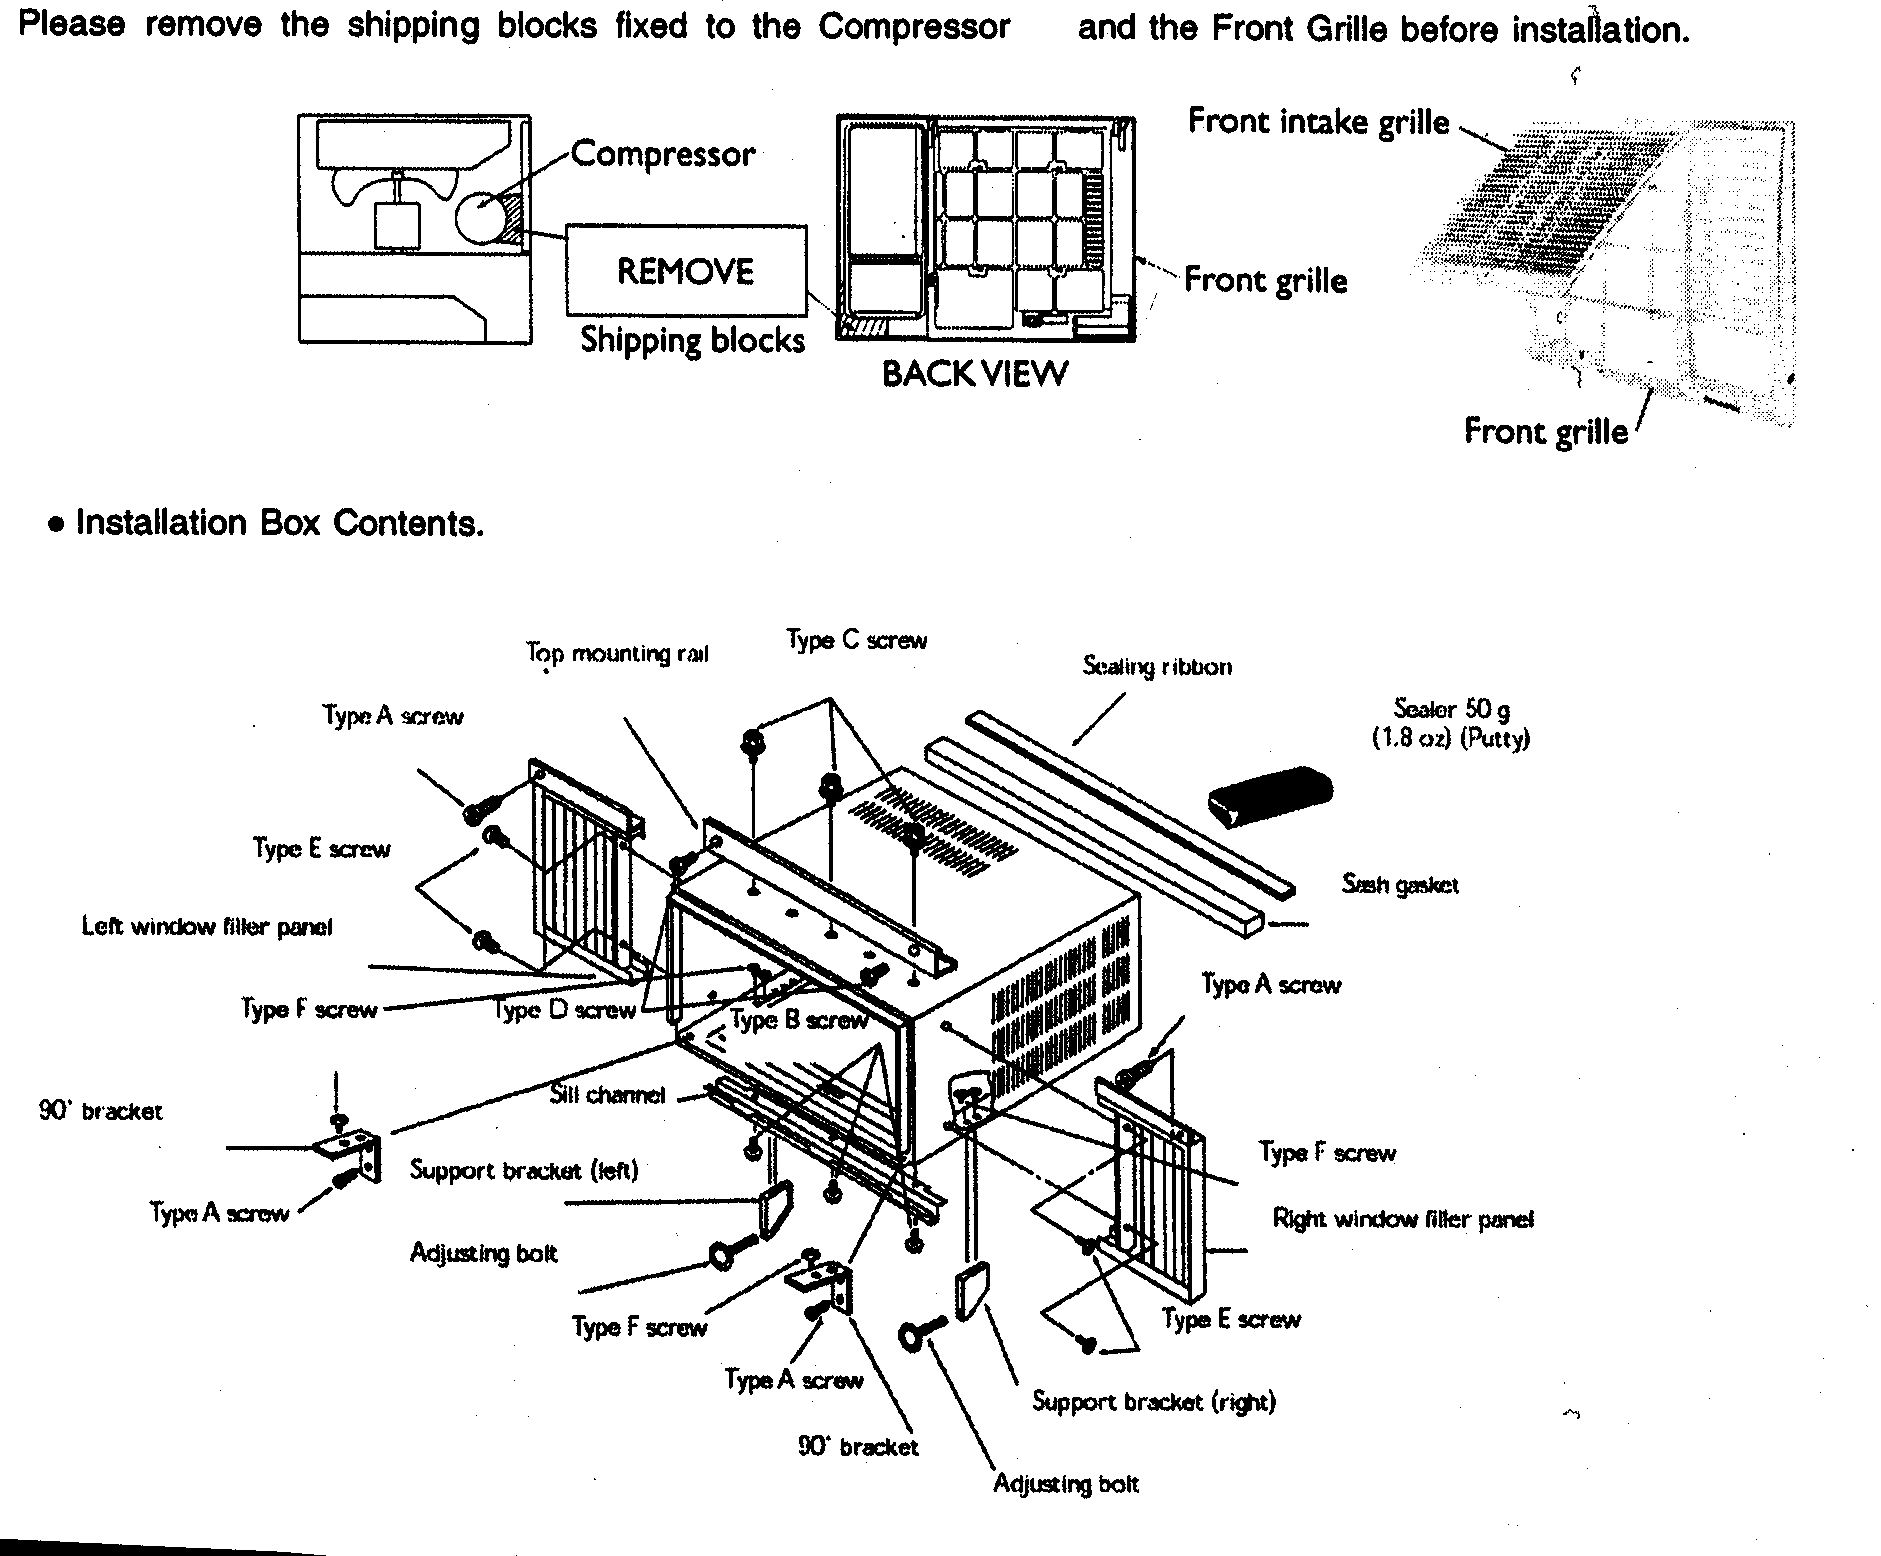 1977 dodge aspen wiring diagram 1977 dodge ramcharger Dodge Ram Wiring Diagram 1979 Chevy Pickup Wiring Diagram